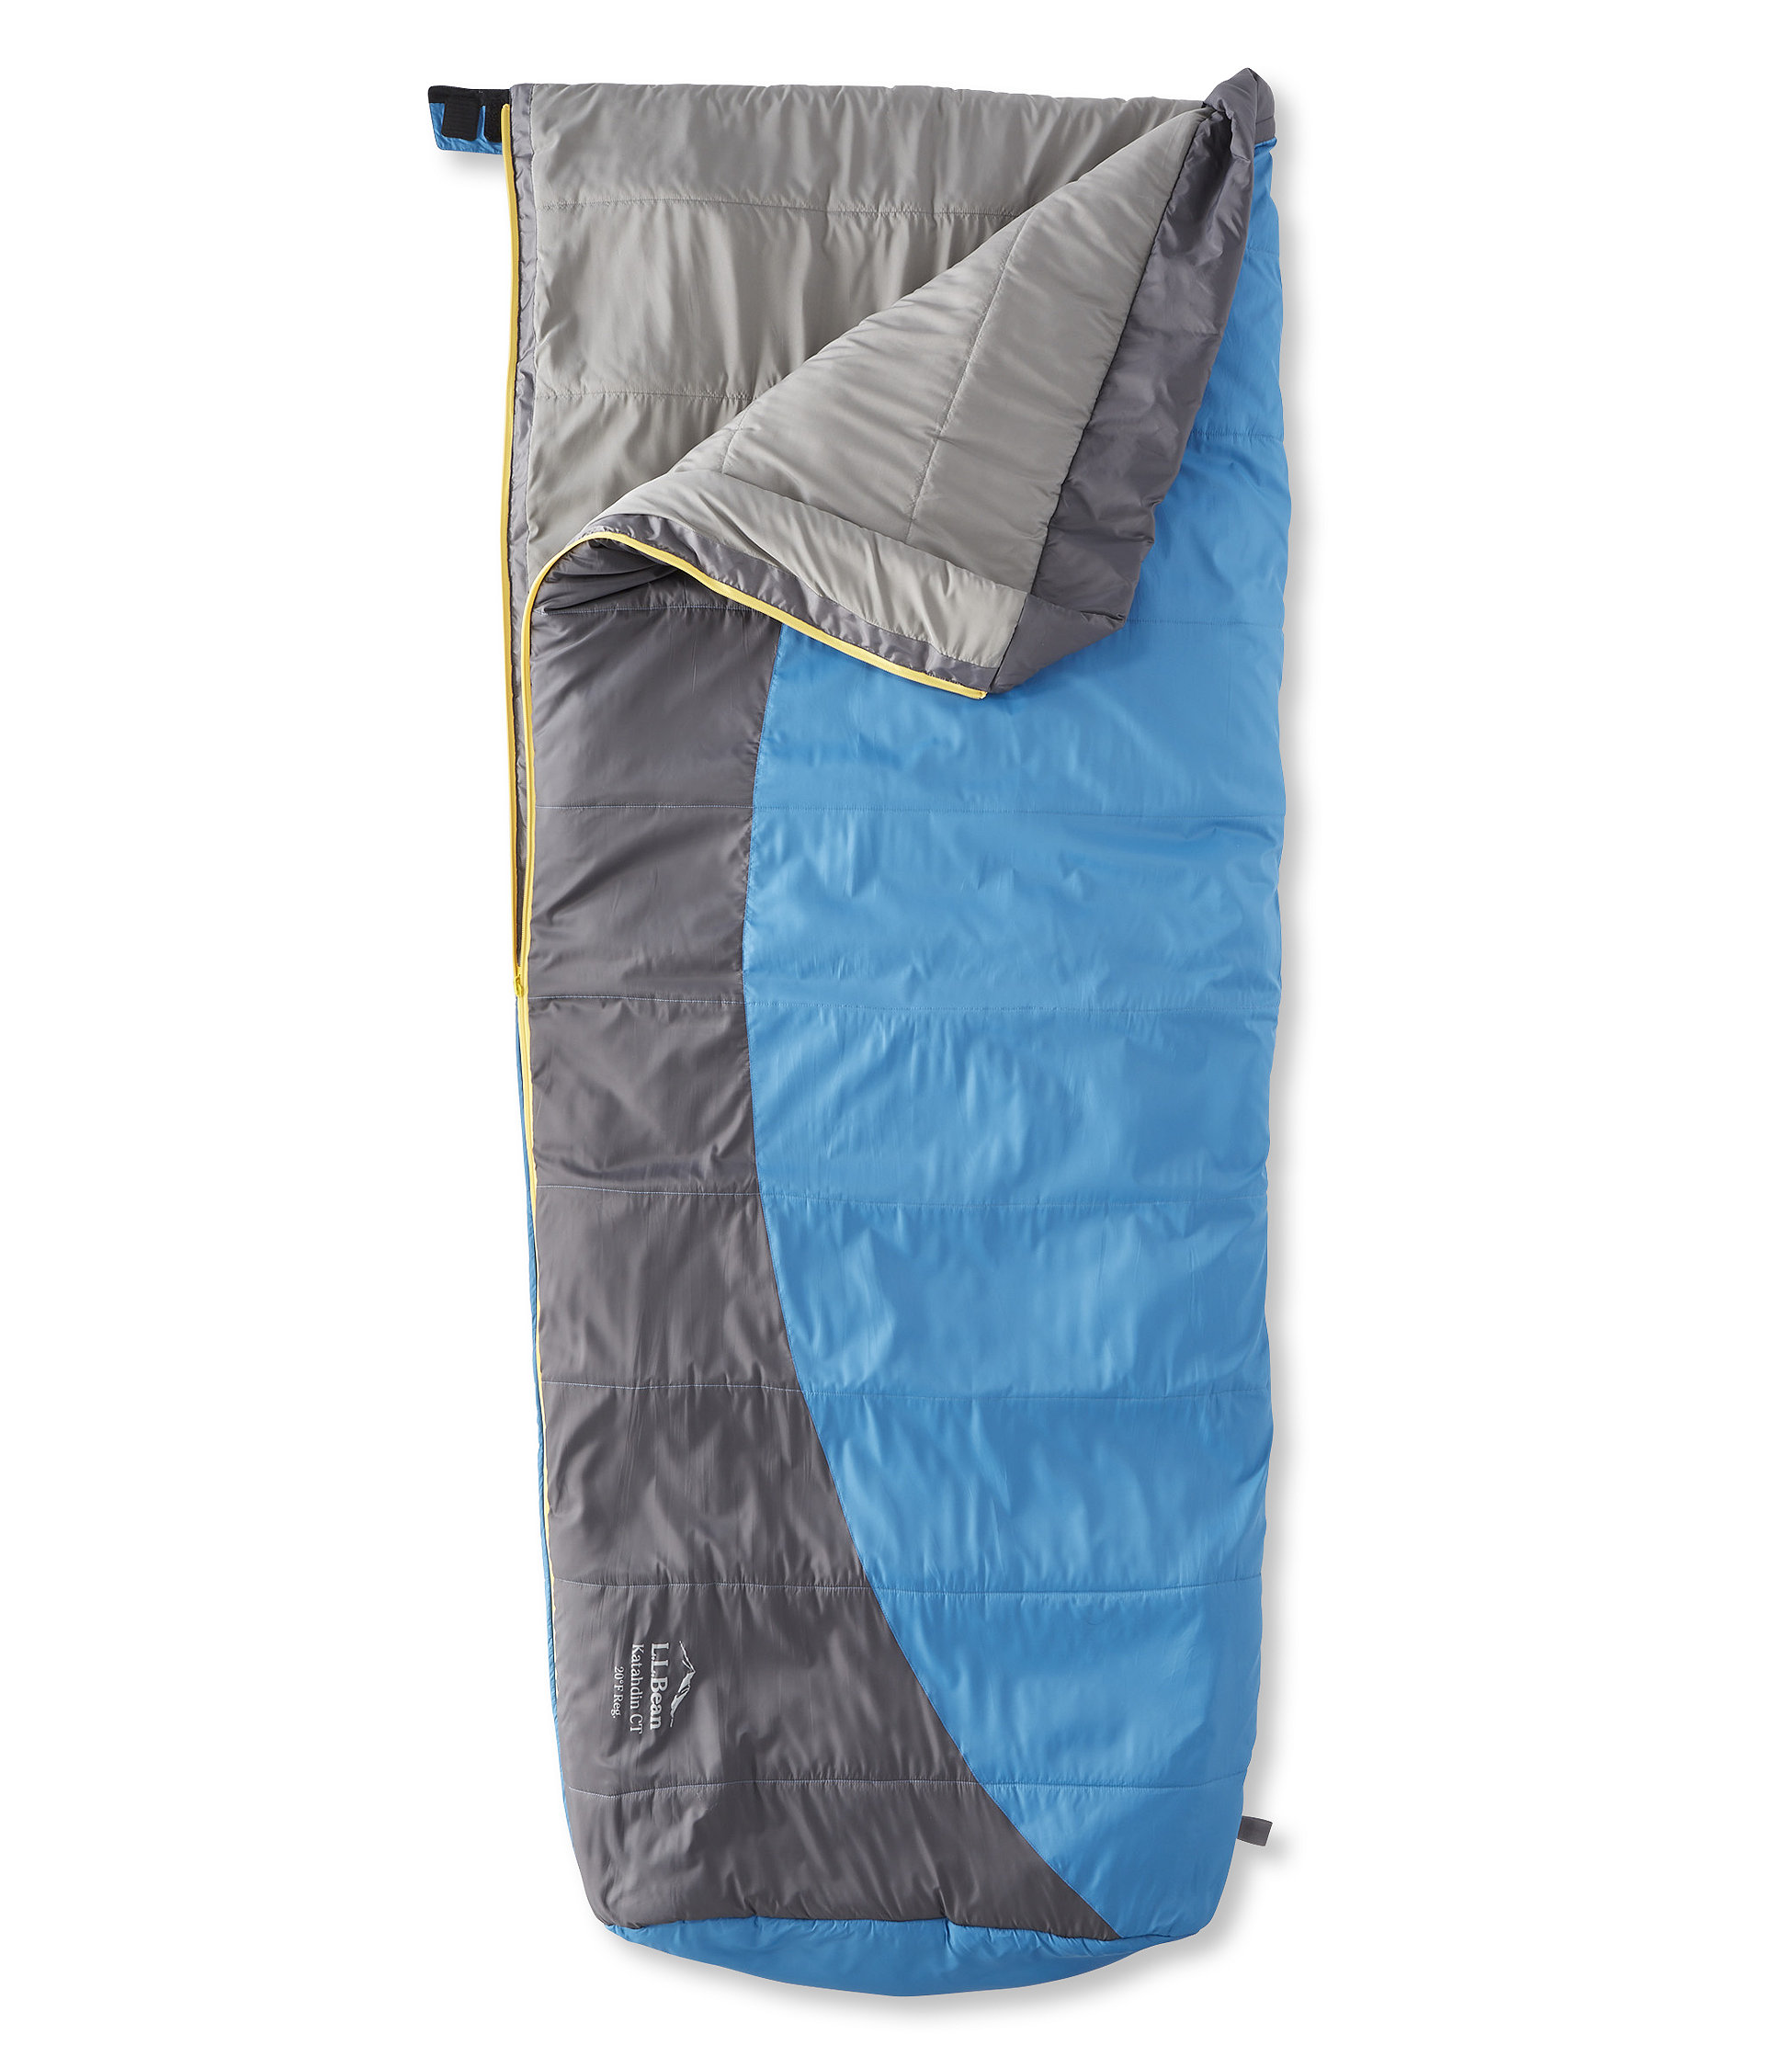 L.L.Bean Katahdin CT Sleeping Bag with Celliant, Rectangular 20°